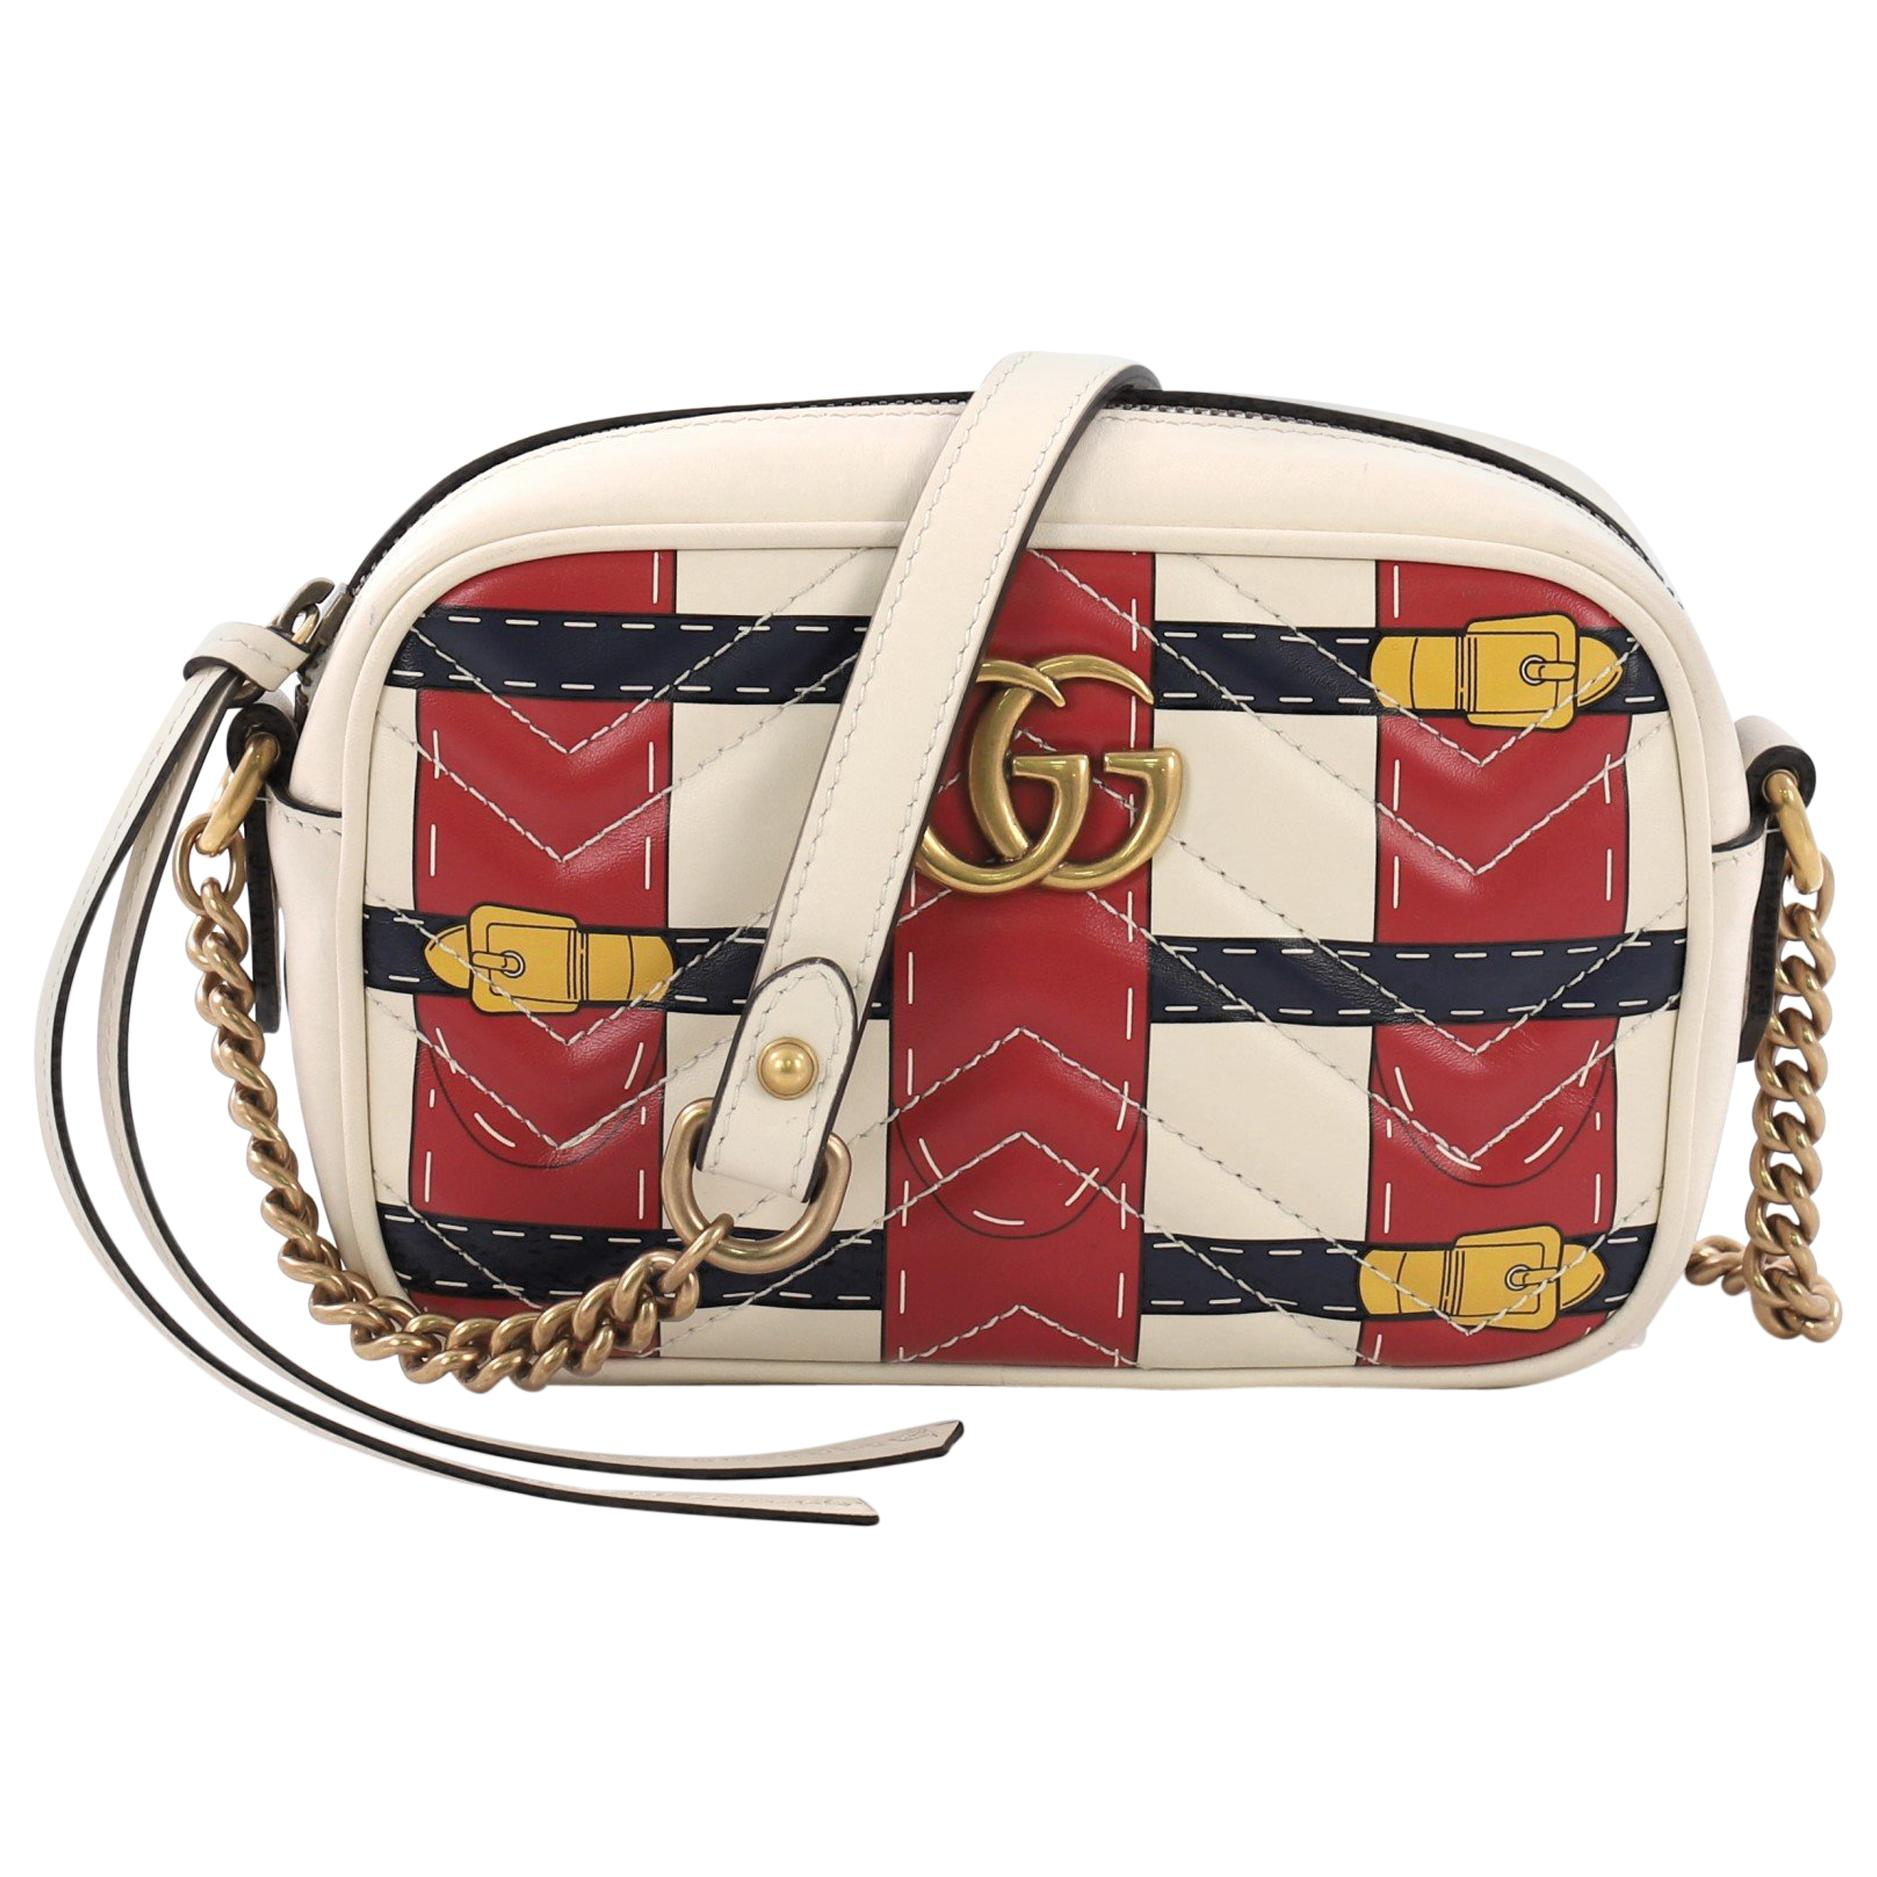 5543b19c5620 Rebag Shoulder Bags - 1stdibs - Page 10